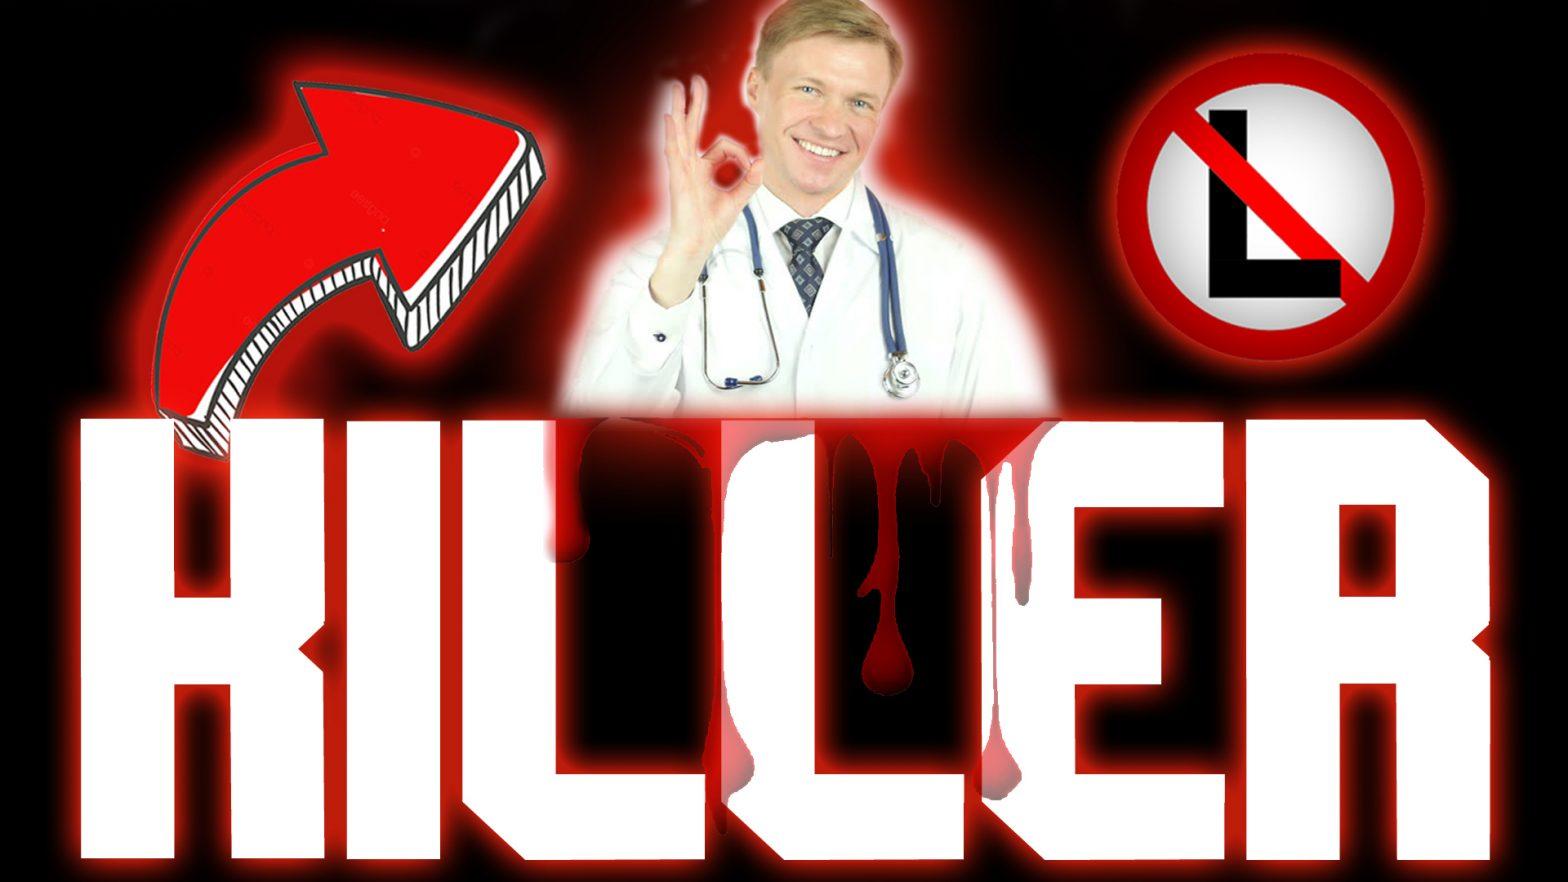 lectin detox medical tyranny doctors gundry